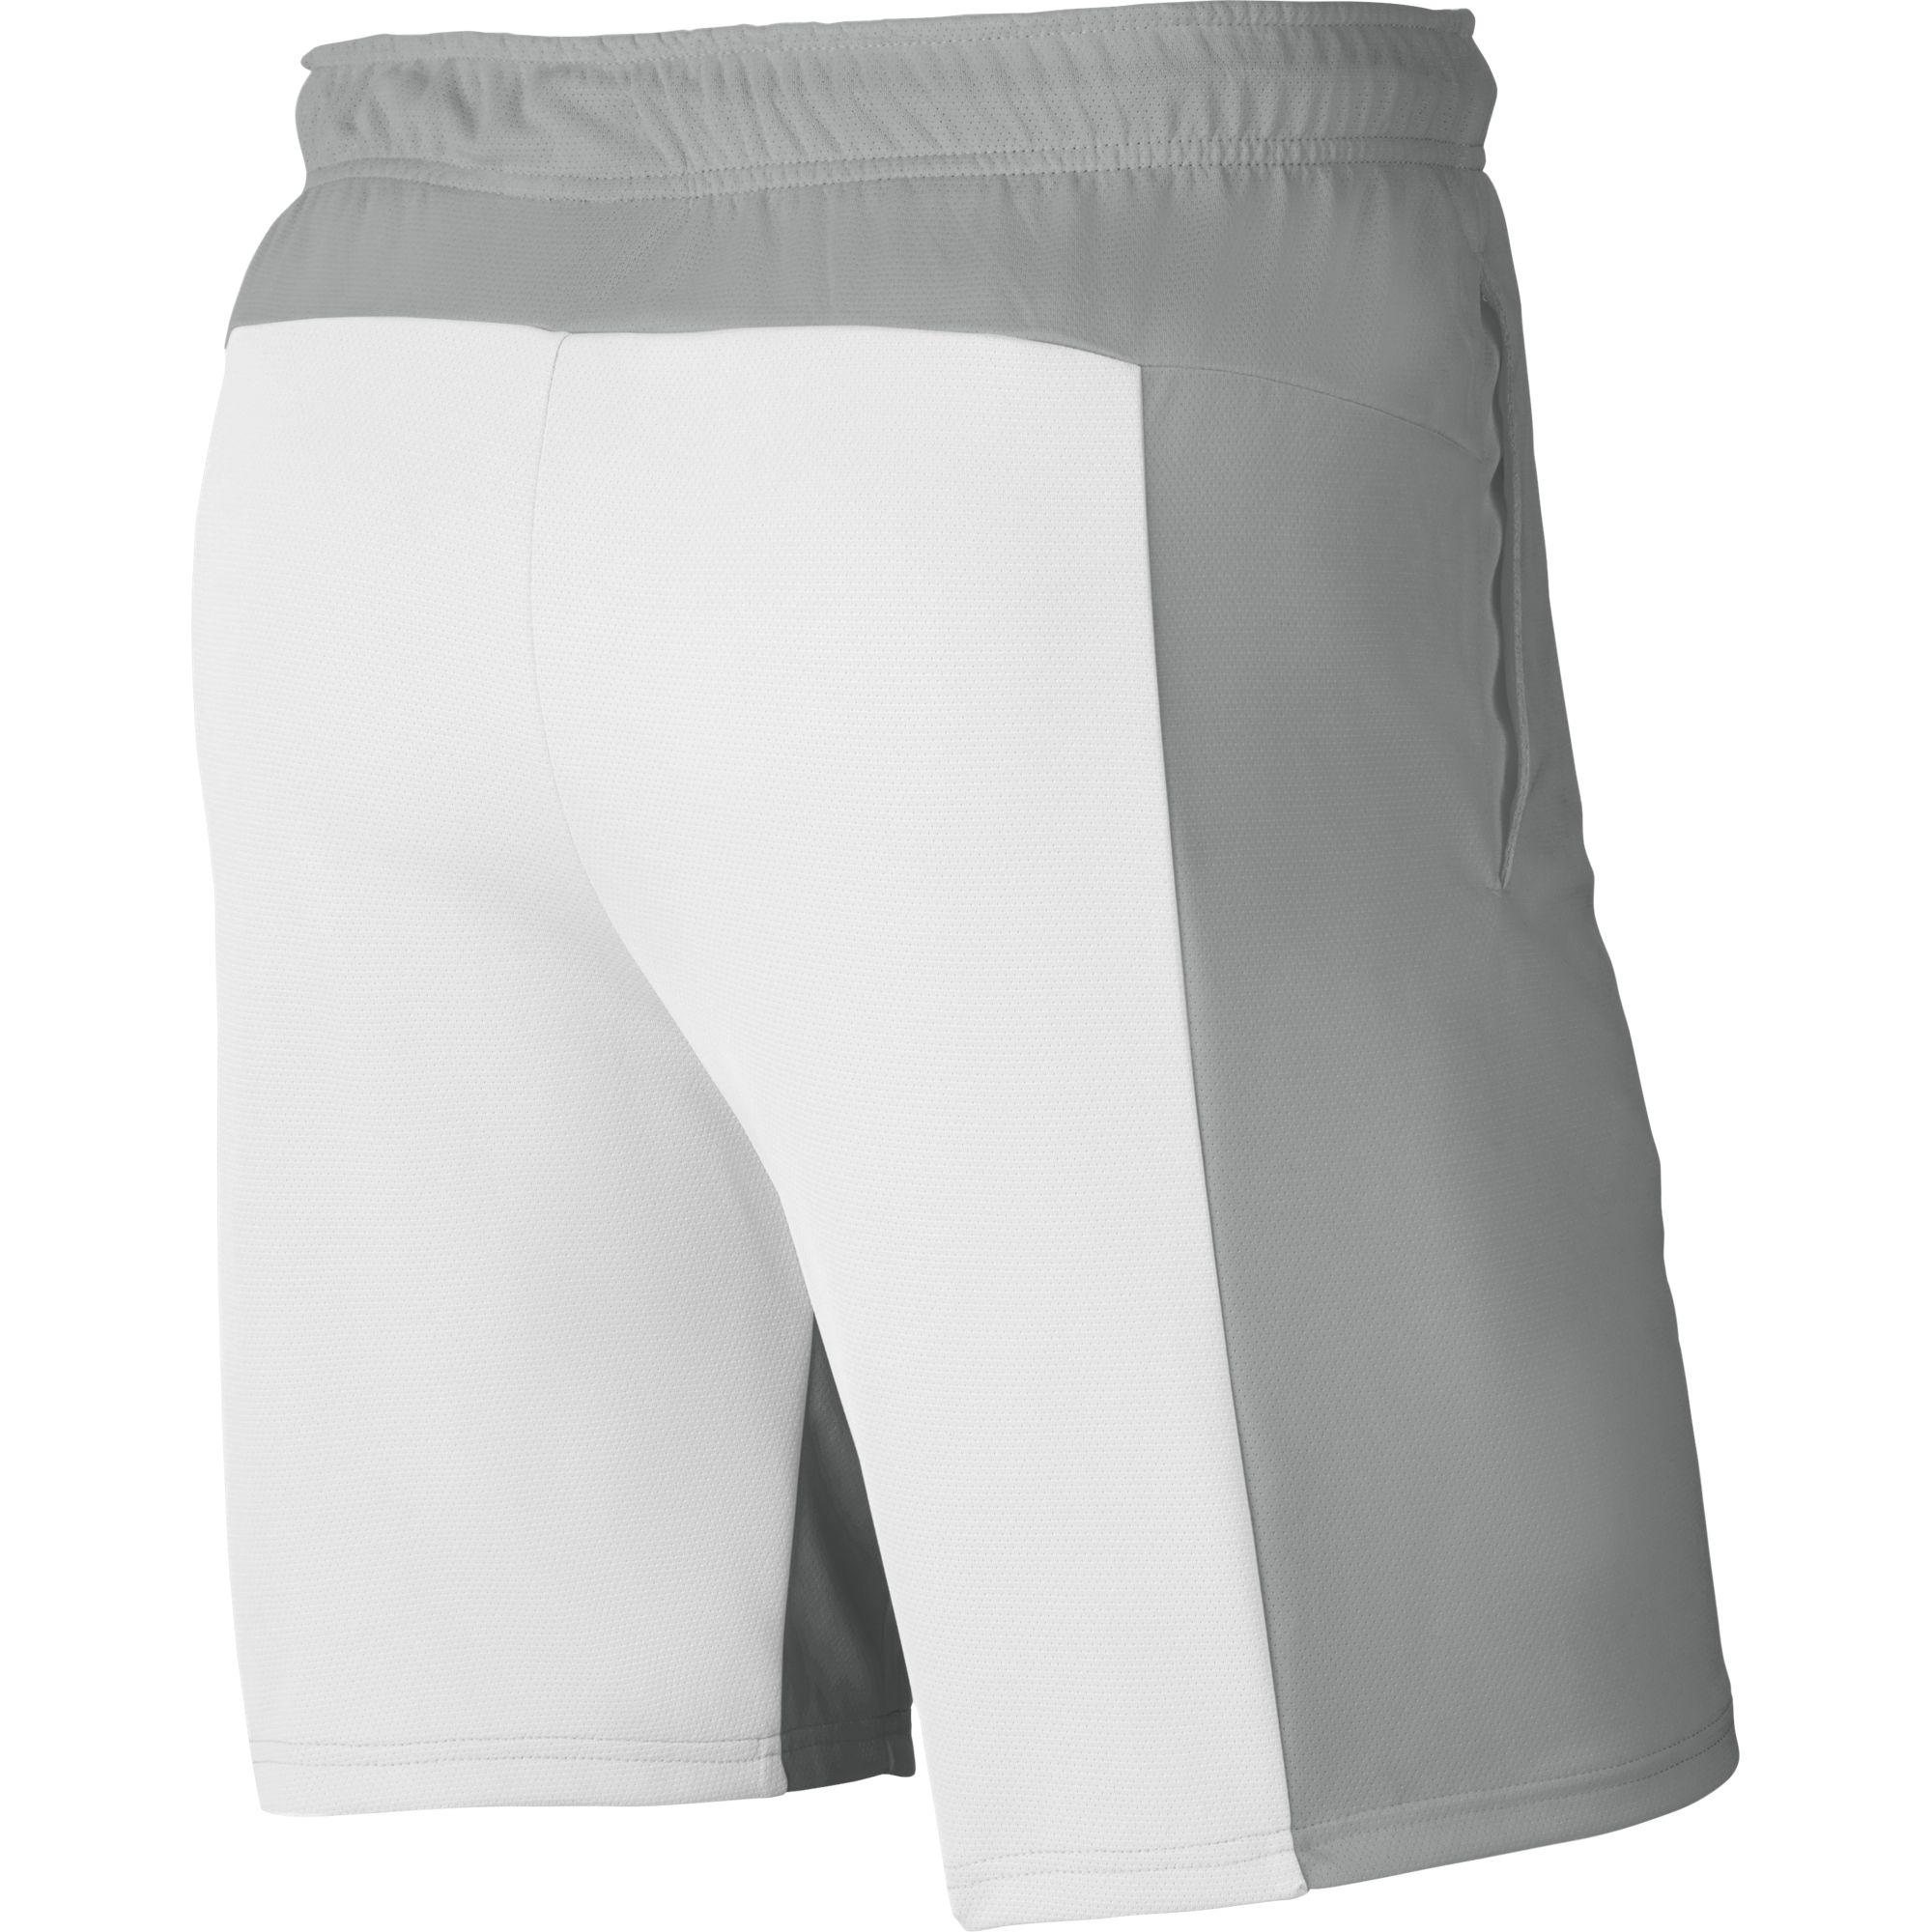 Men's Dri-FIT 5.0 PX GFX Training Shorts, Heather Gray, swatch